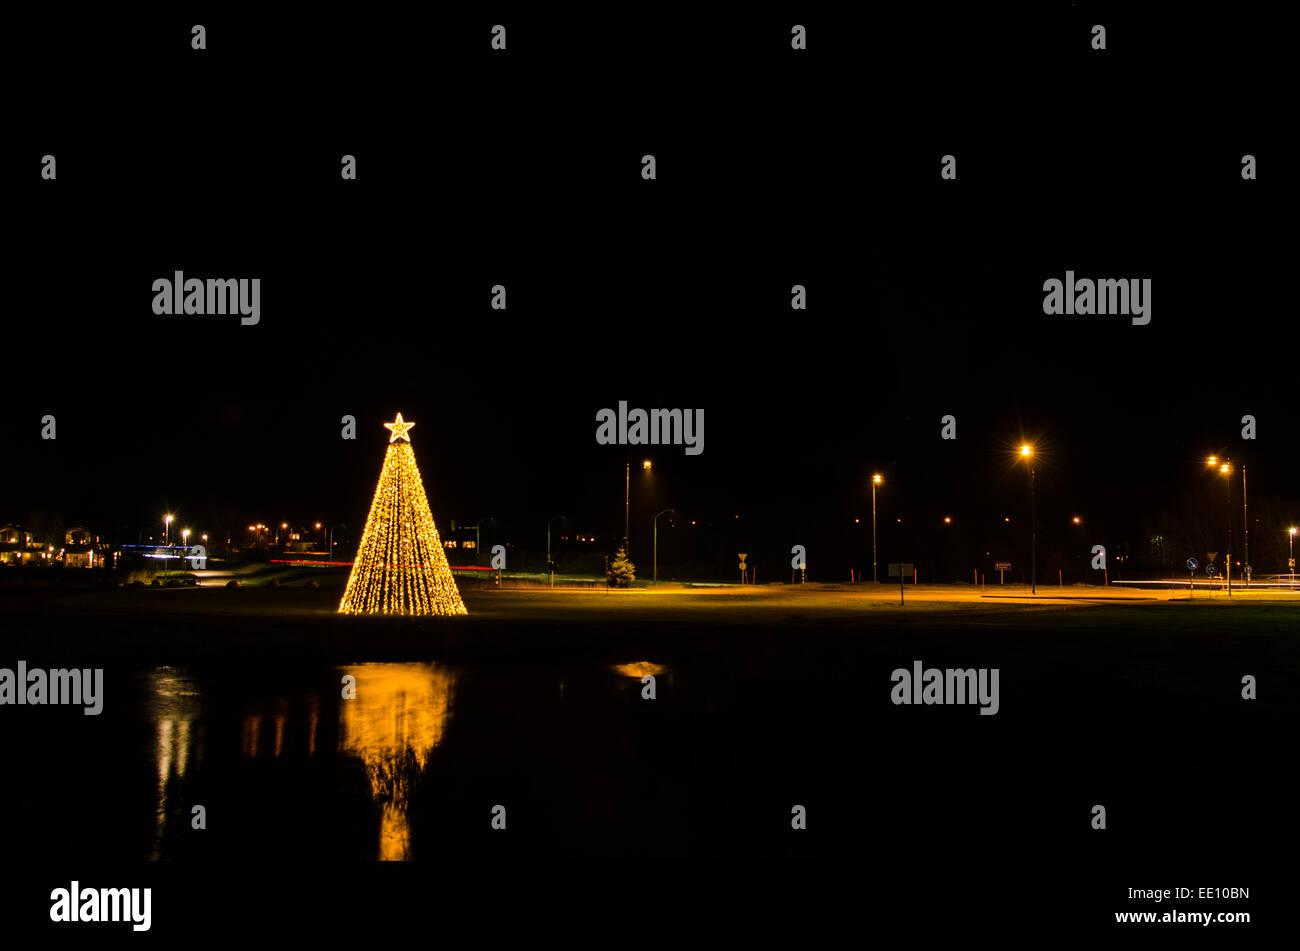 Outdoors view at an illumination lika a christmas tree - Stock Image